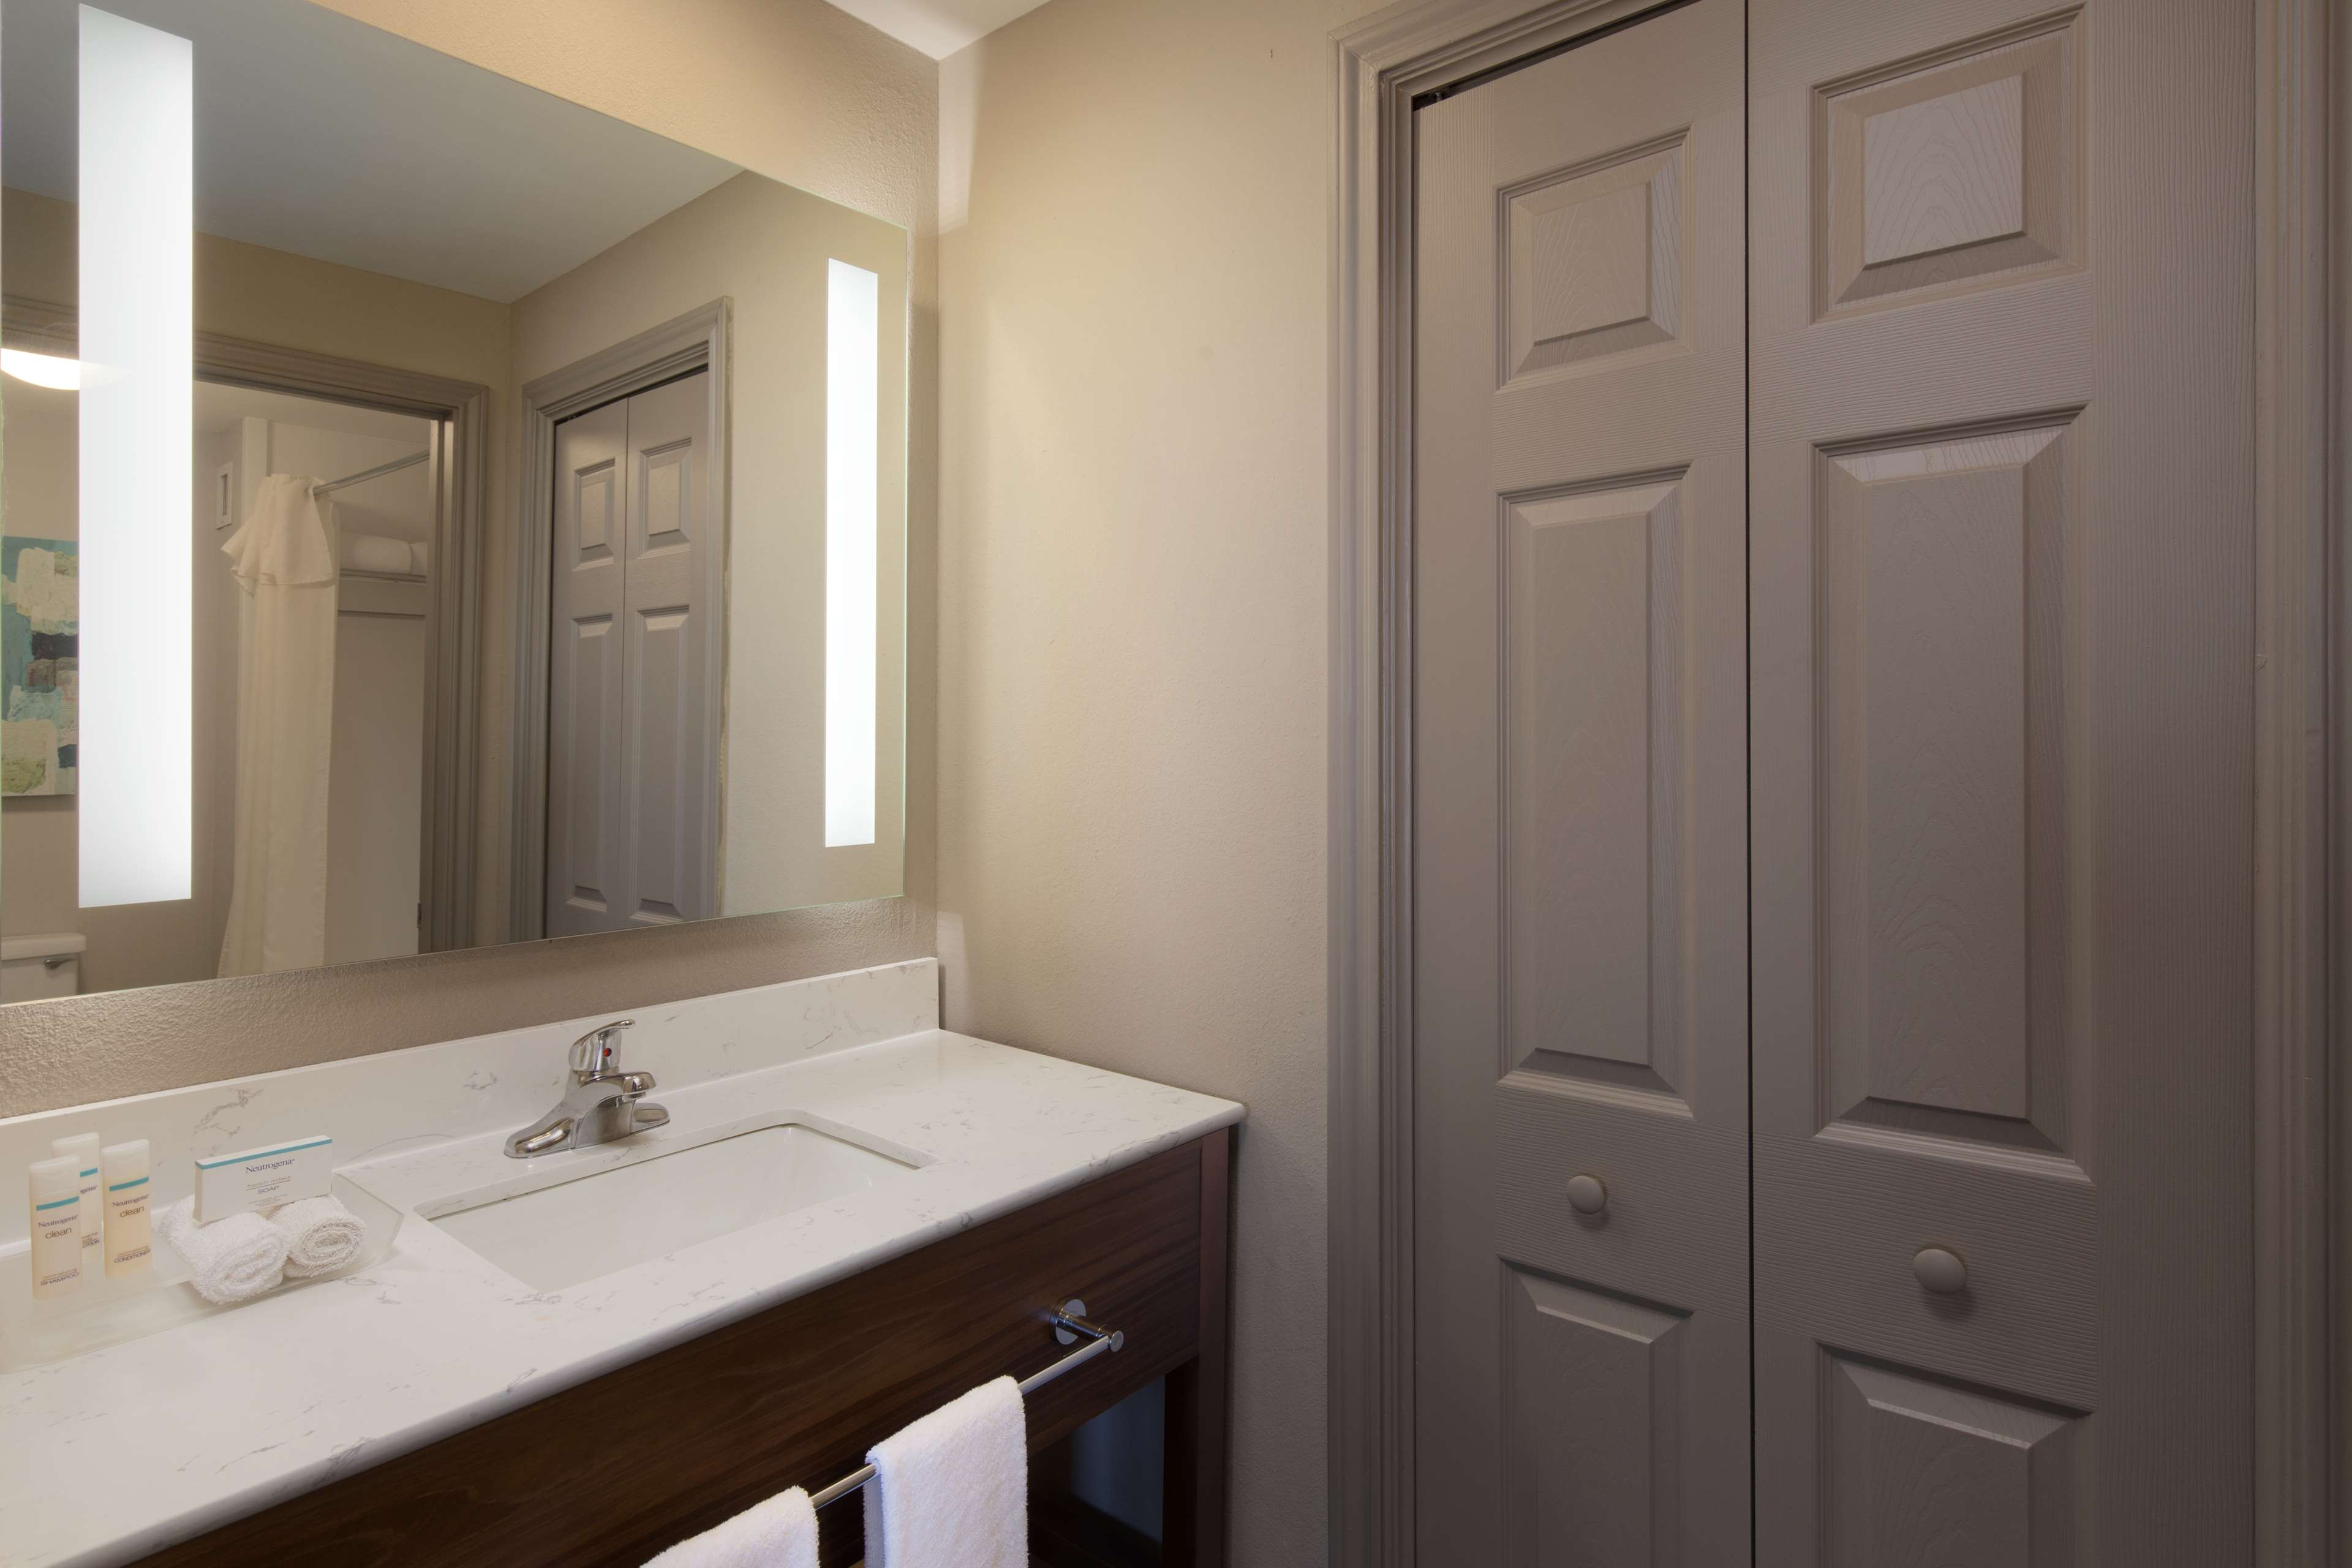 Homewood Suites by Hilton Lubbock image 13